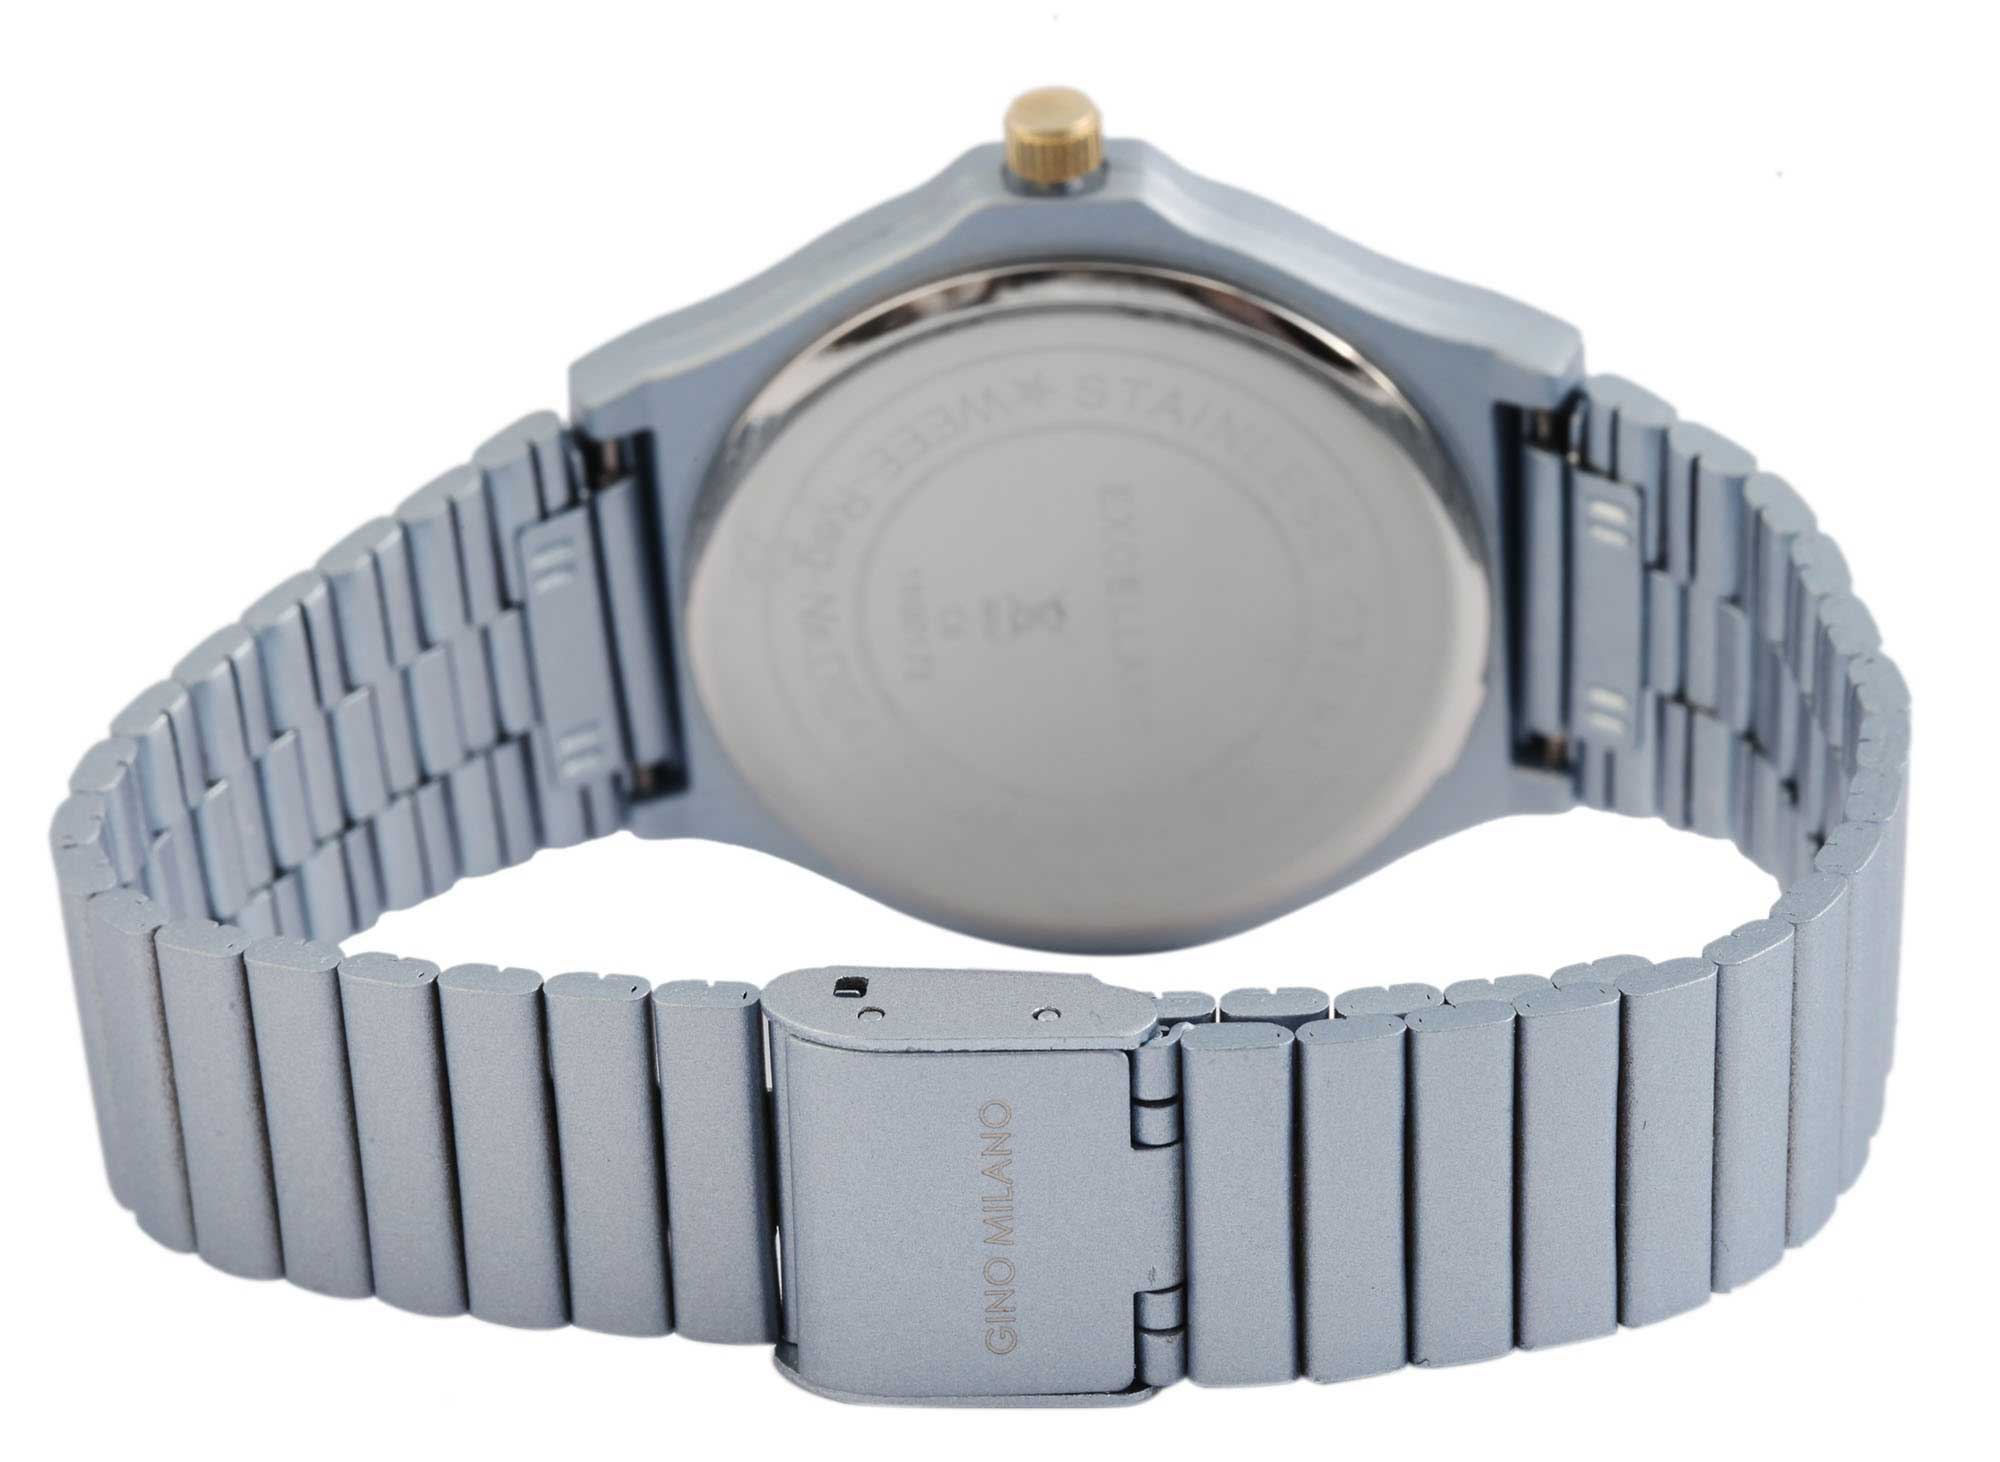 Damenuhr Armbanduhr Excellanc analog Uhr hellblau